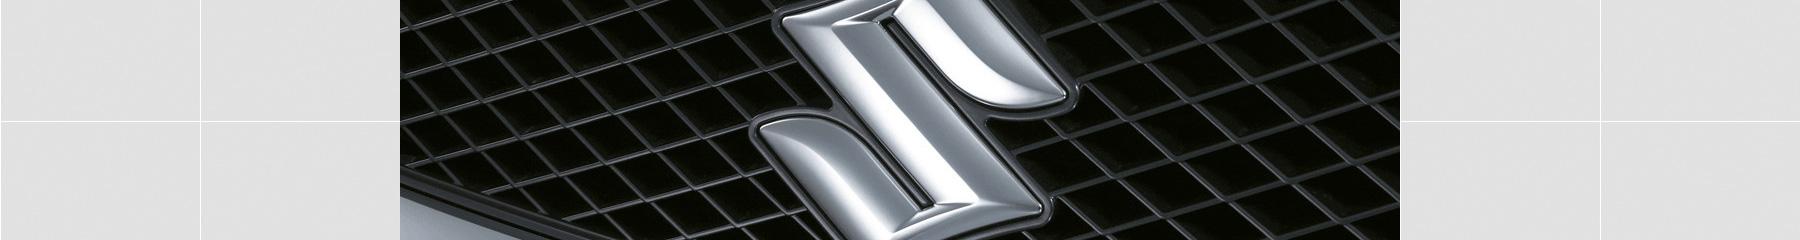 Close up of the Suzuki emblem on the grille of a Suzuki Swift hatch in silver.